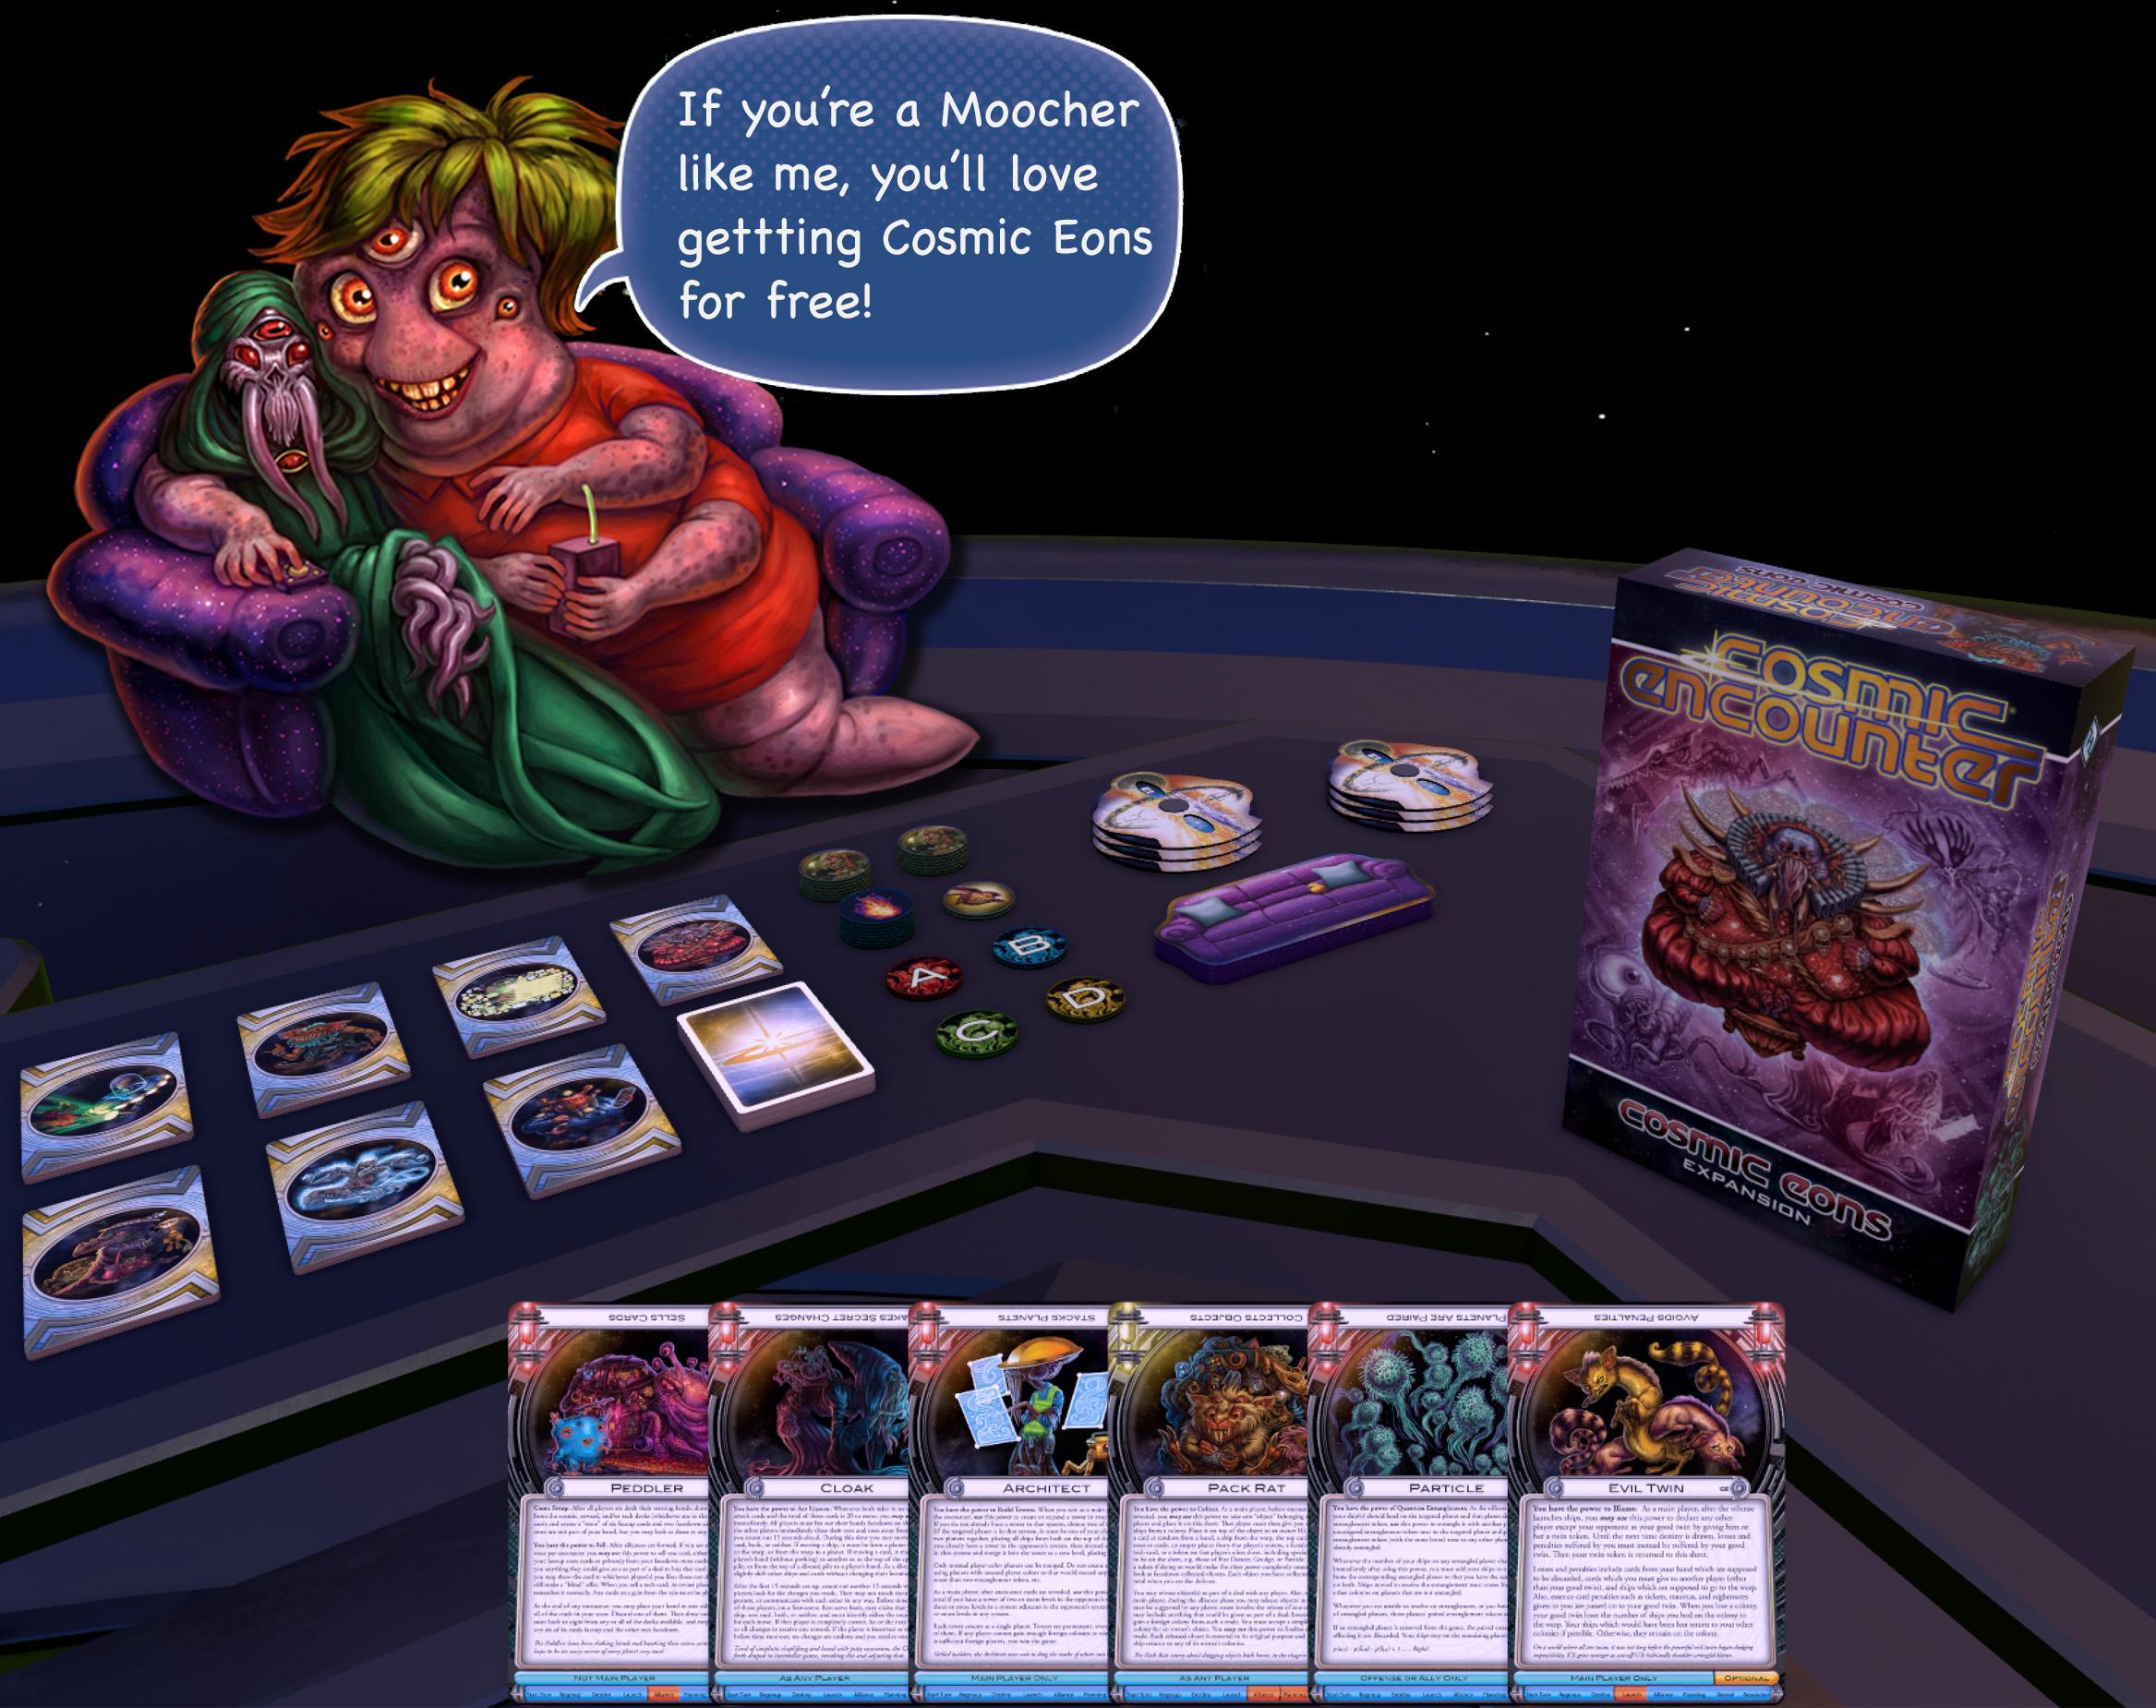 playnow-gamesetup10.jpg